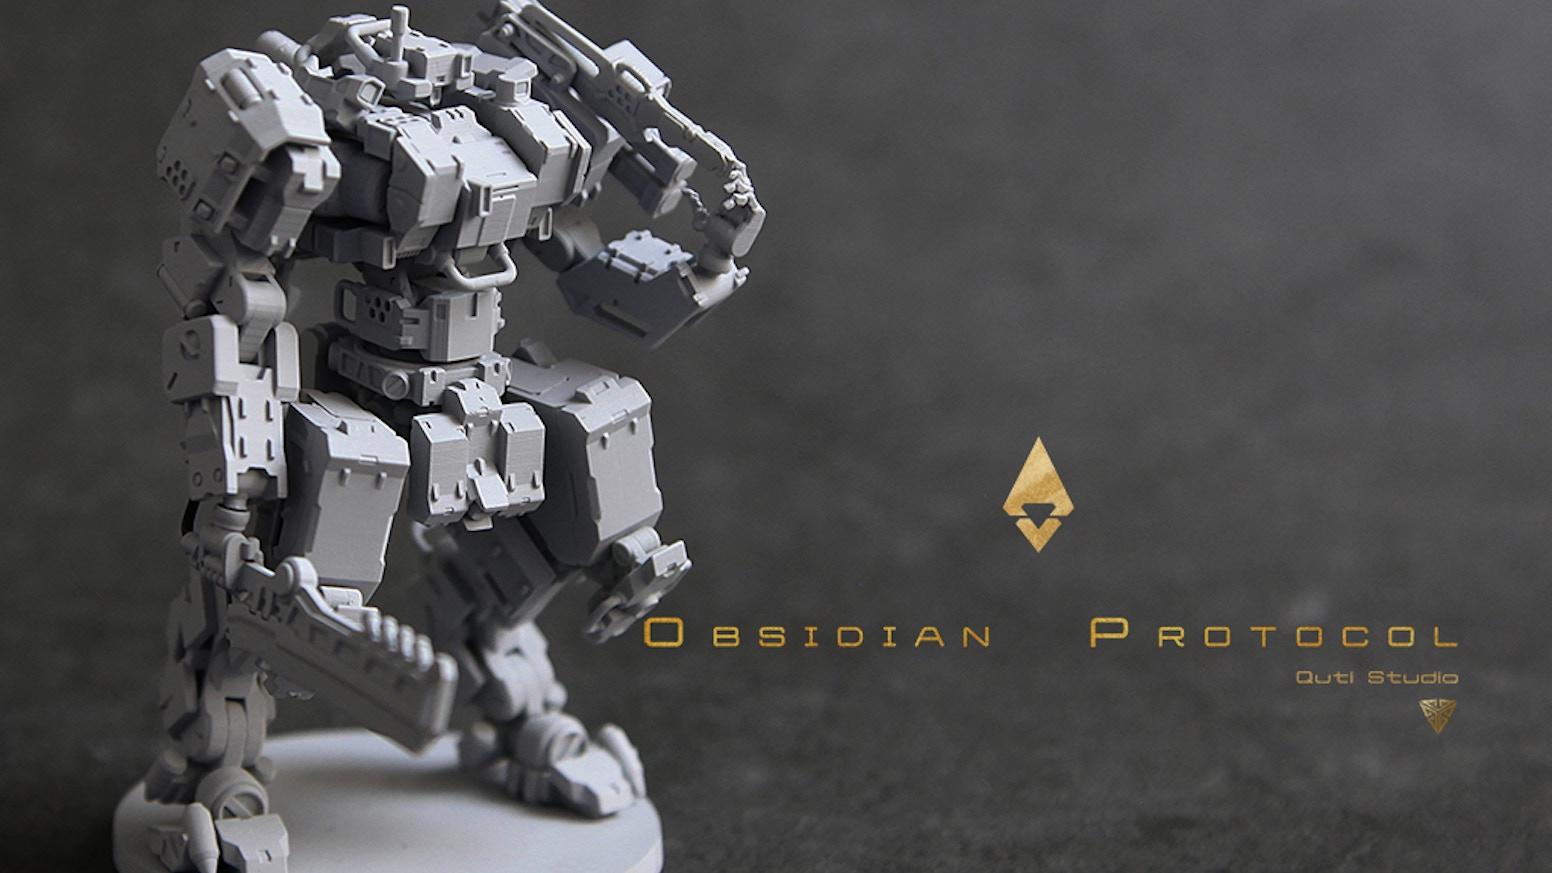 Obsidian Protocol